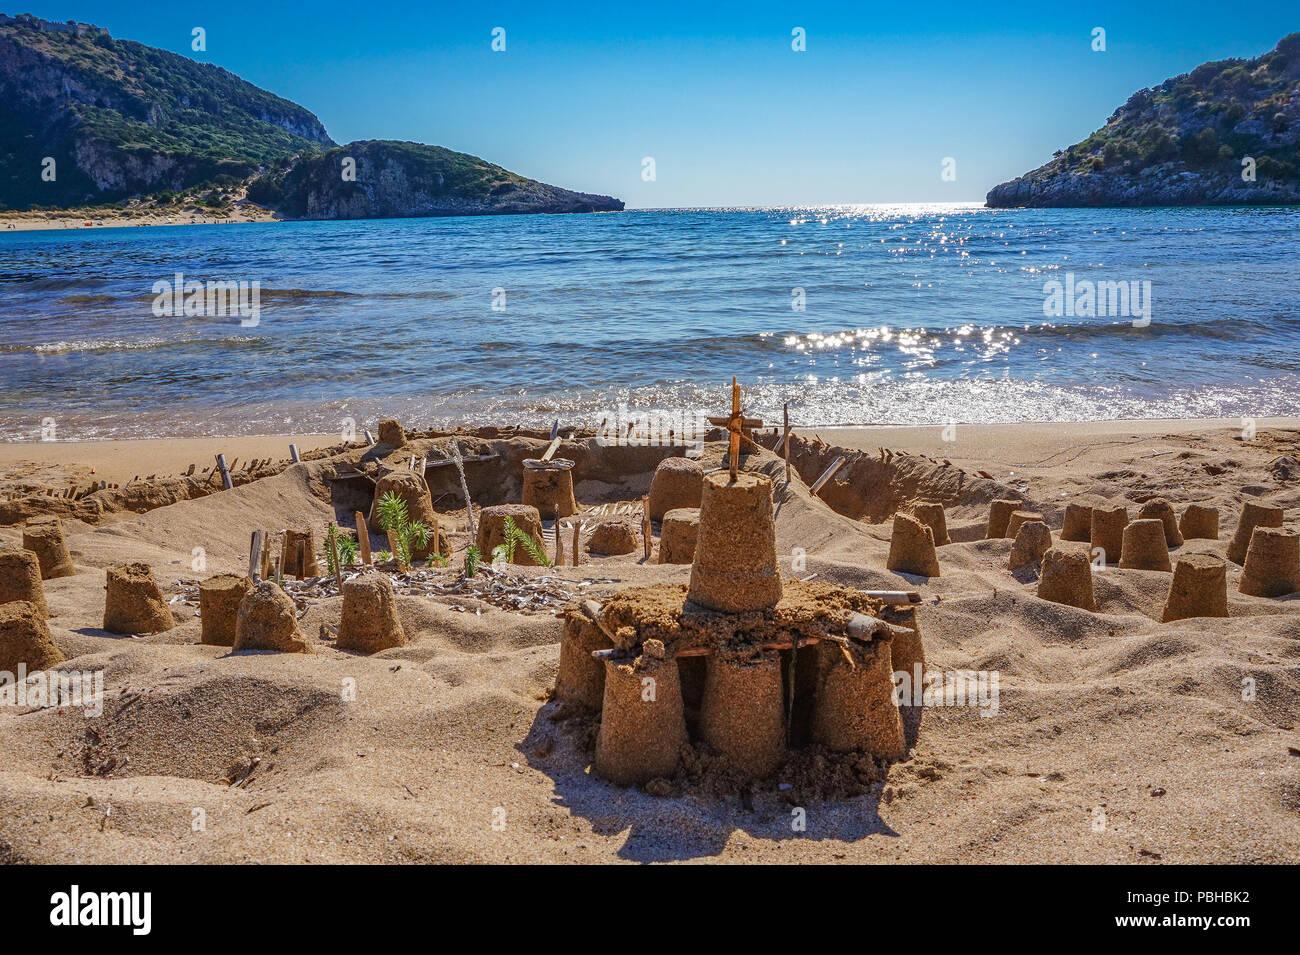 Castle made of sand on the beautiful beach of Voidokilia, Messenia, Greece - Stock Image